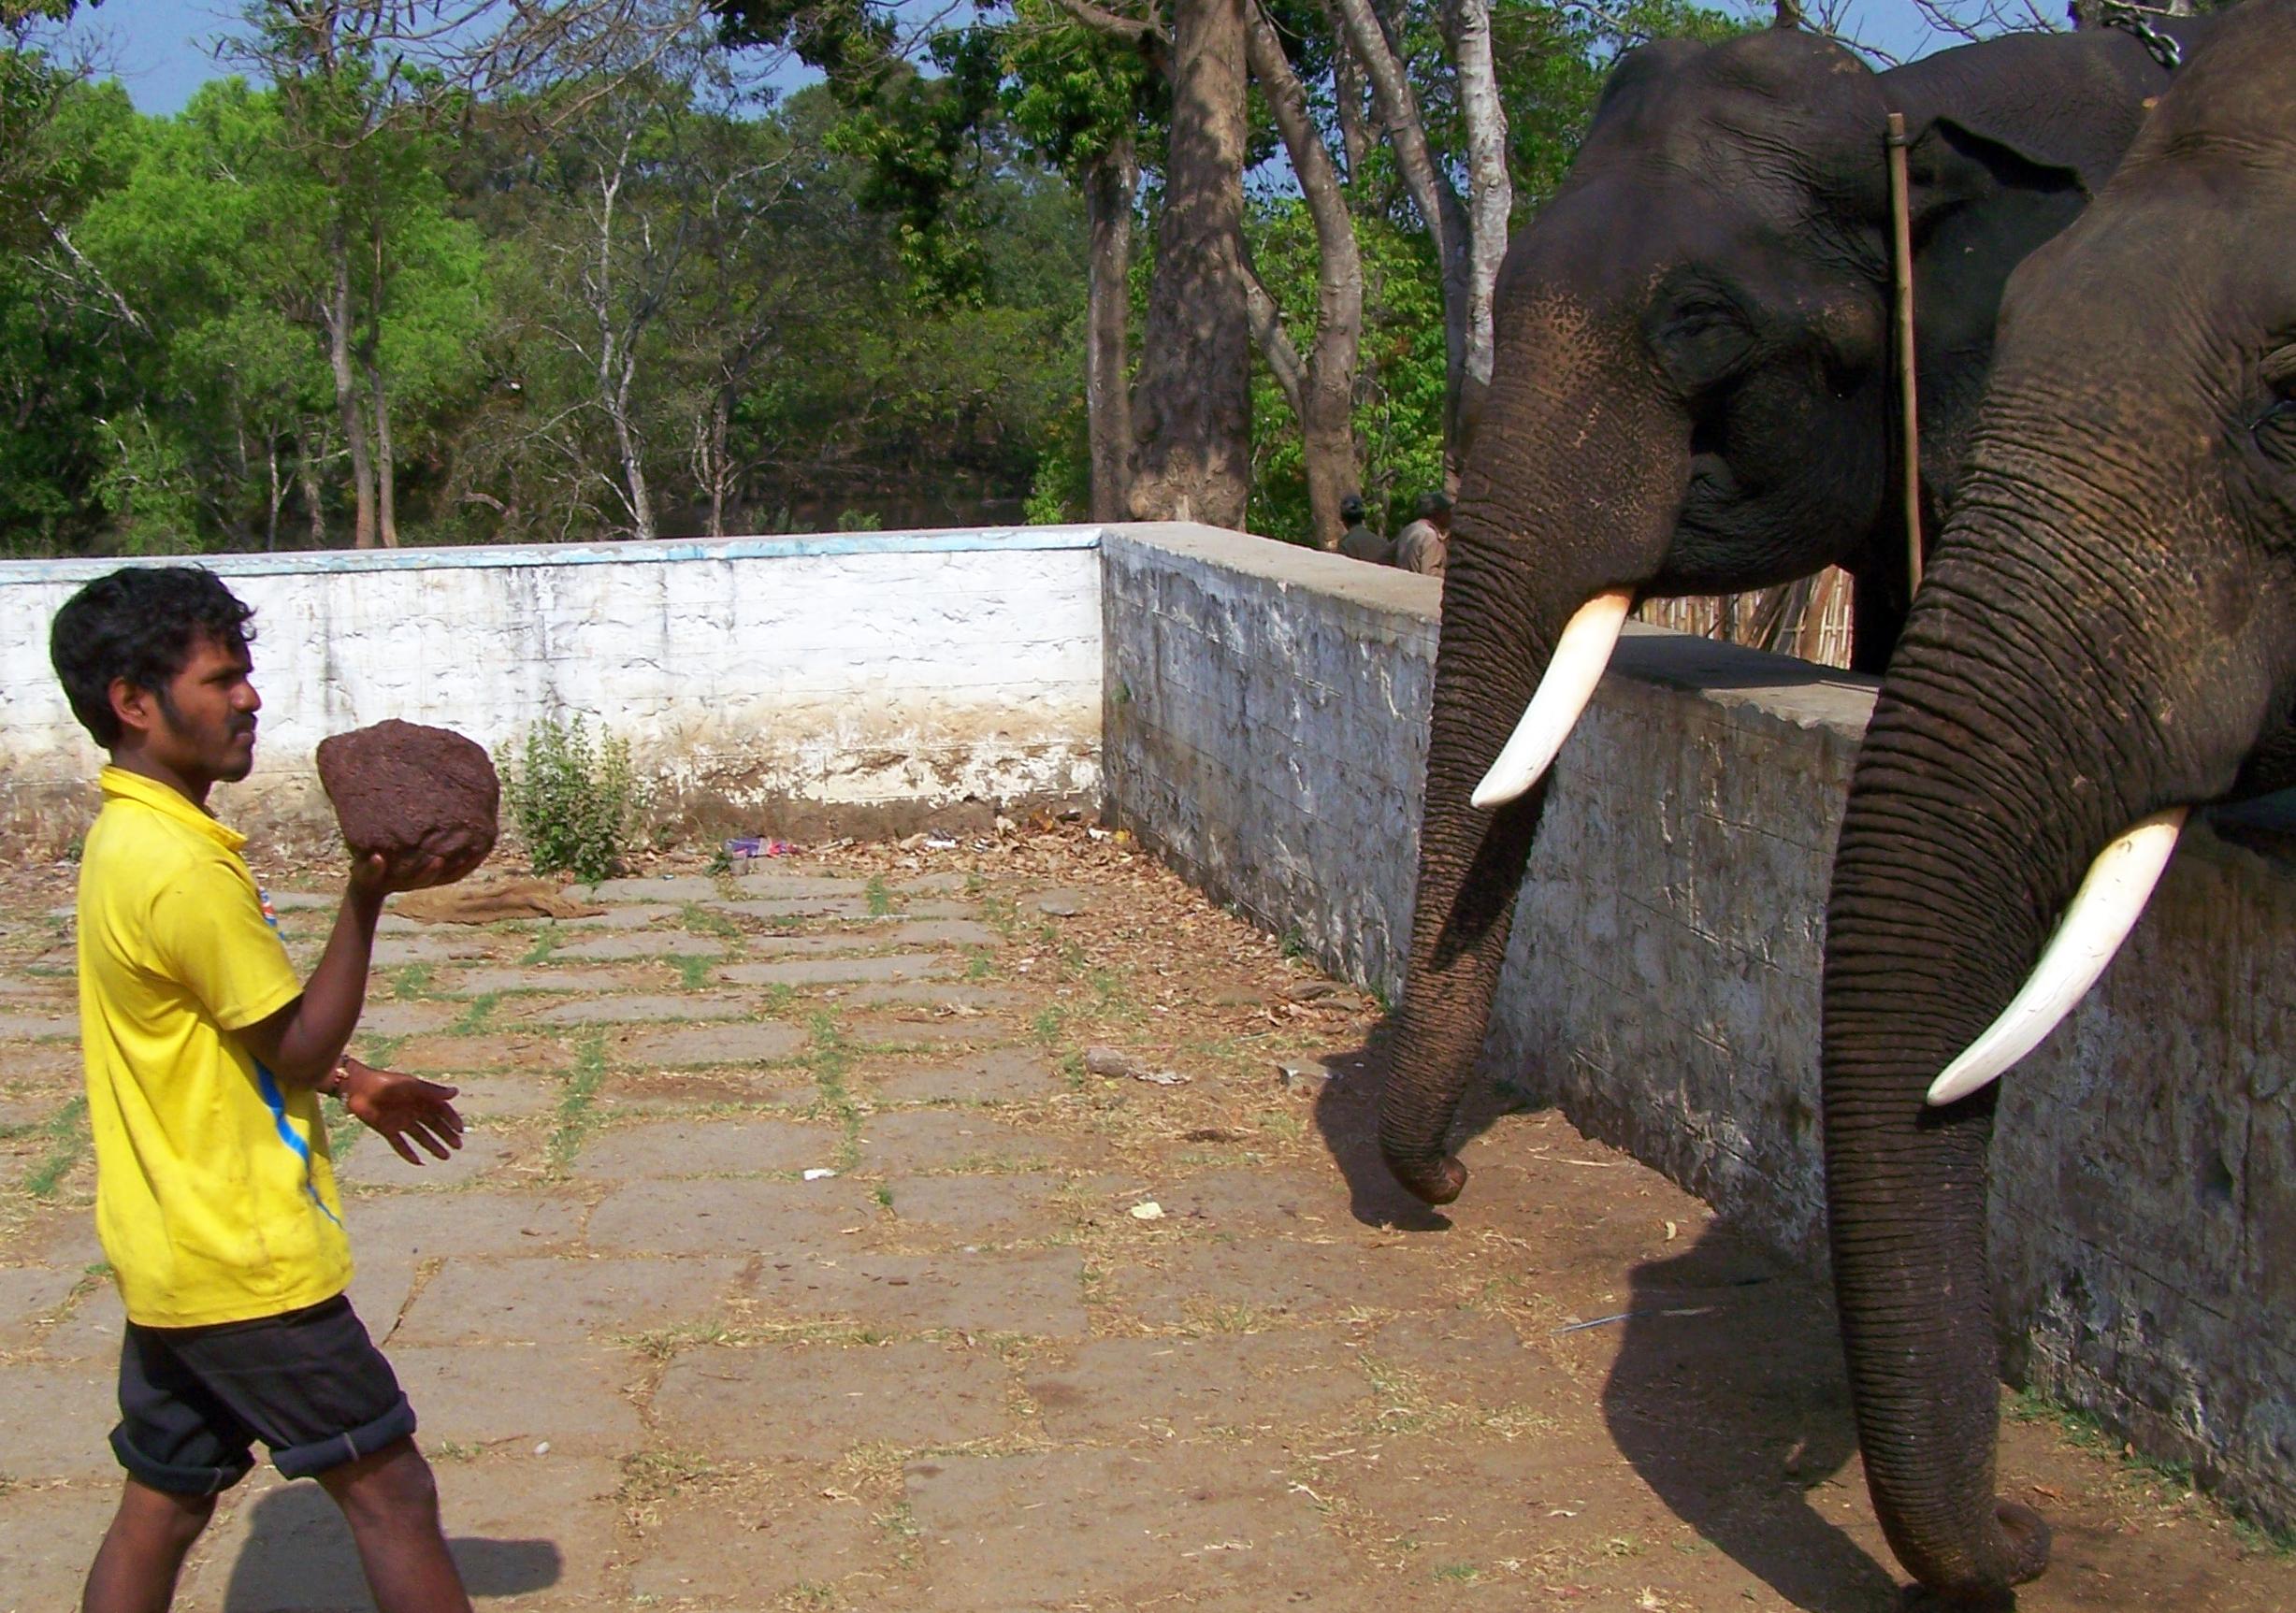 Elefanter matas med Mudde FOTO ZAC OYEAH